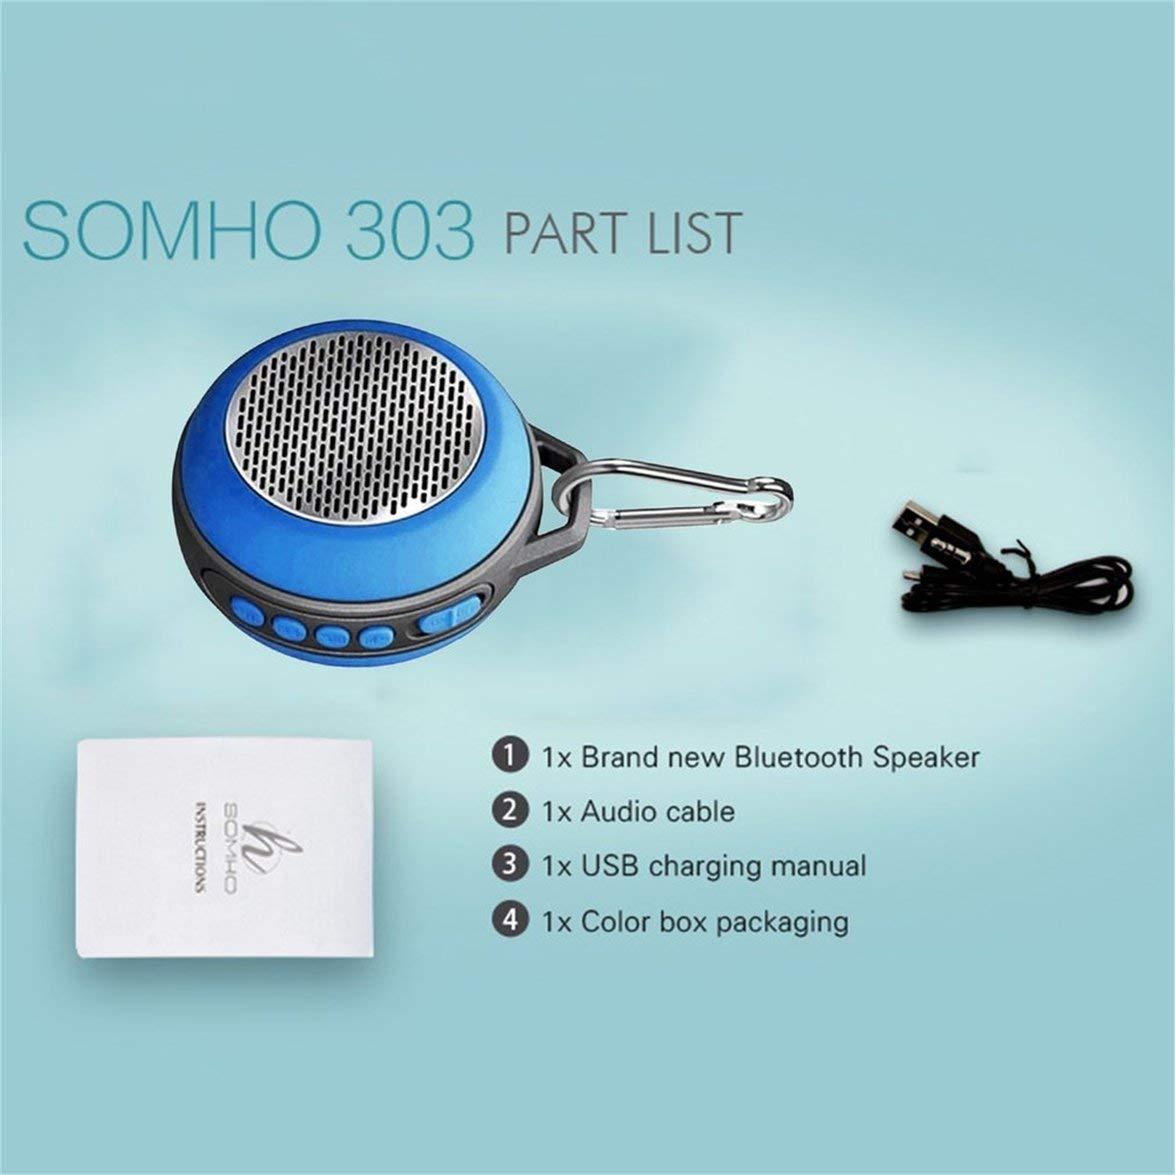 Kongqiabona SOMHO S303 Altavoz con Bluetooth Mini Altavoz portátil inalámbrico con música Bluetooth Altavoz Exterior con Manos Libres Altavoz con ...